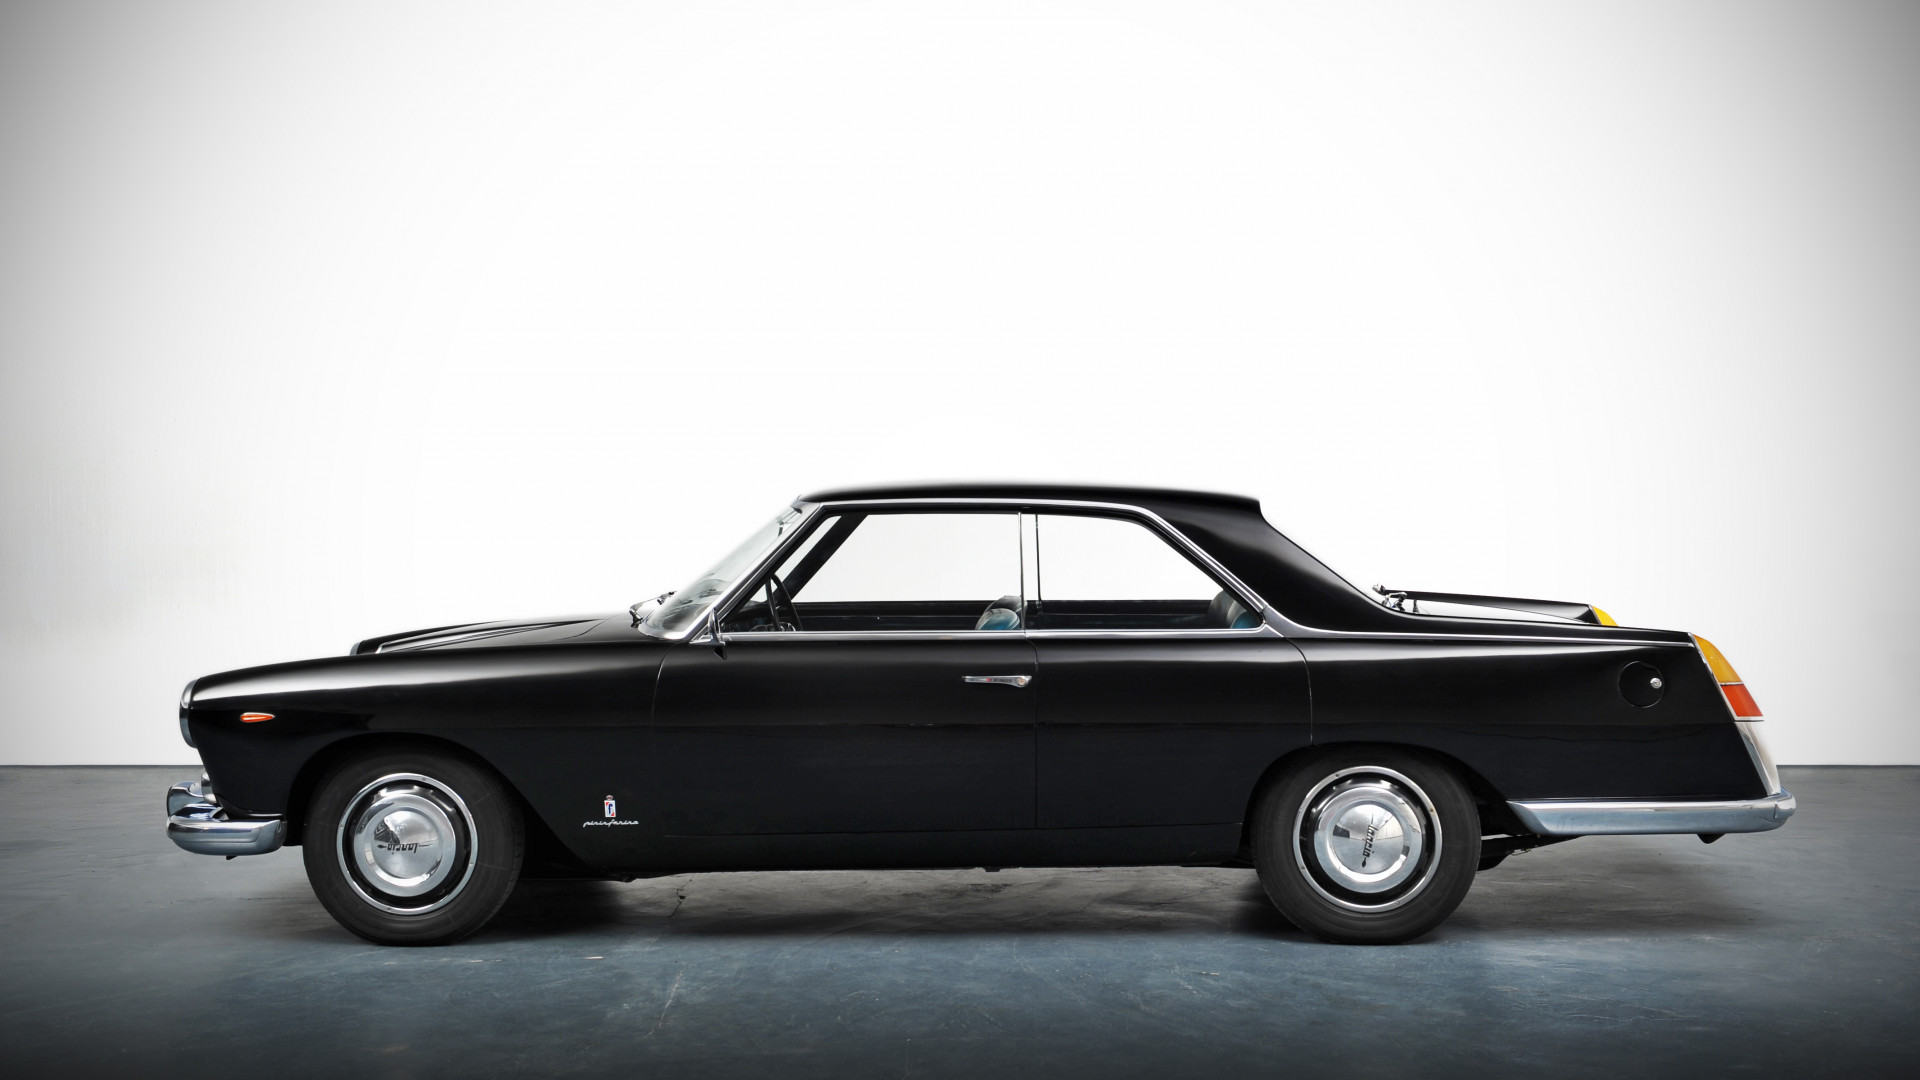 Lancia Florida II